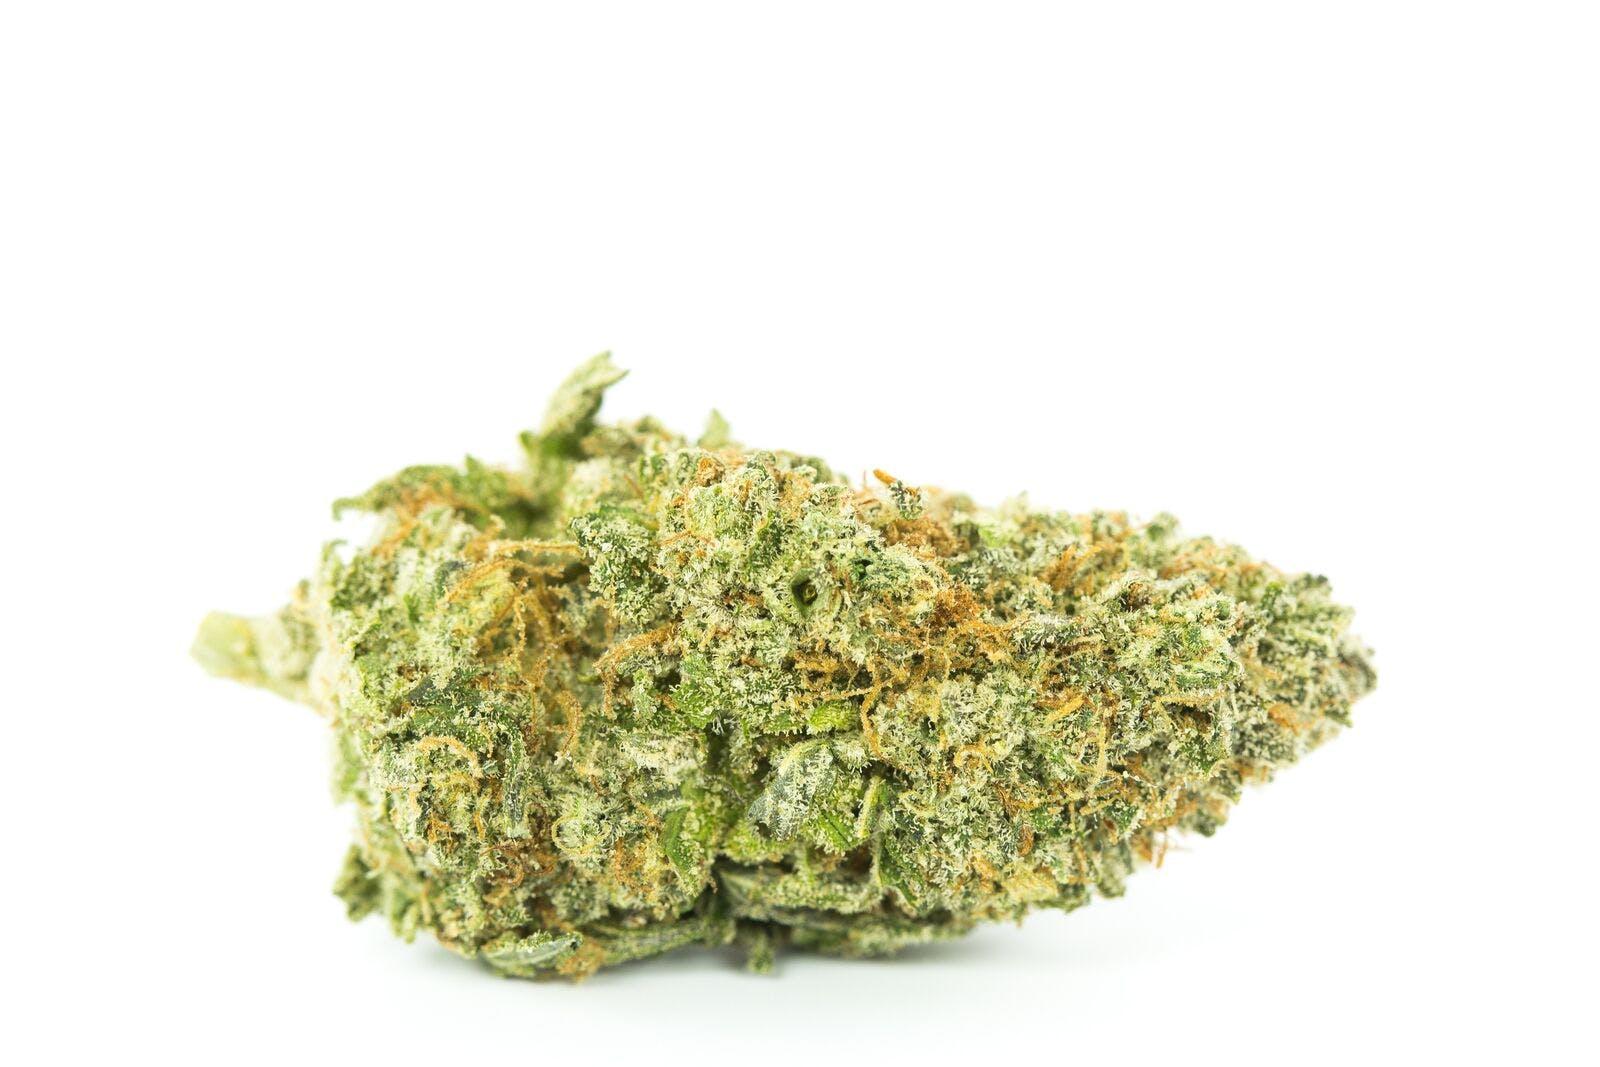 Platinum Blackberry Weed; Platinum Blackberry Cannabis Strain; Platinum Blackberry Indica Marijuana Strain